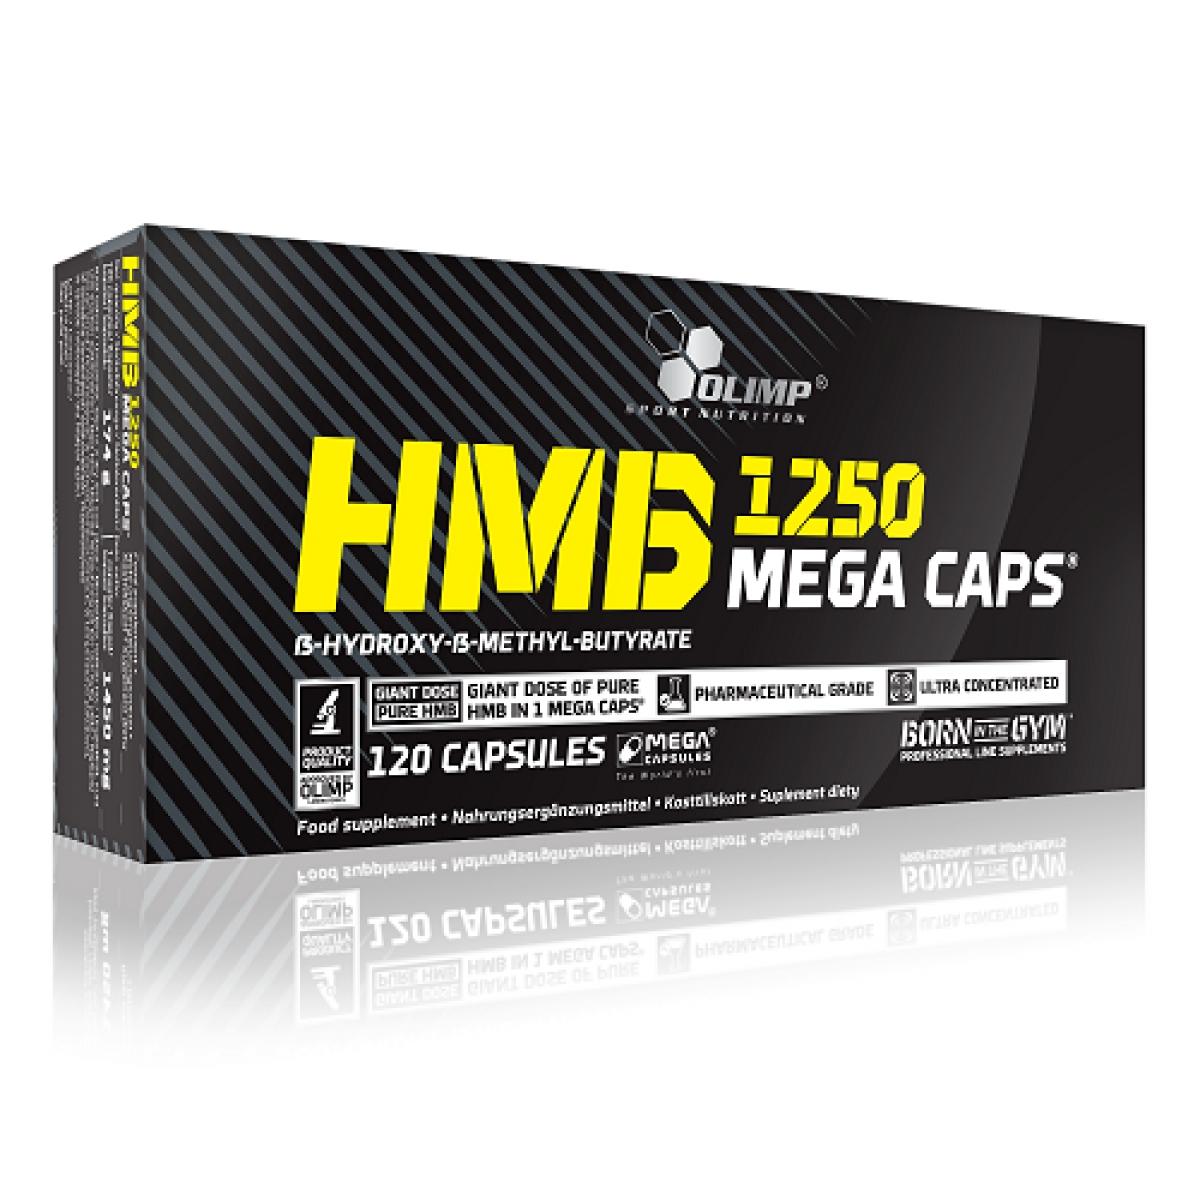 OLIMP HMB MEGA CAPS, 120 CAPSULES